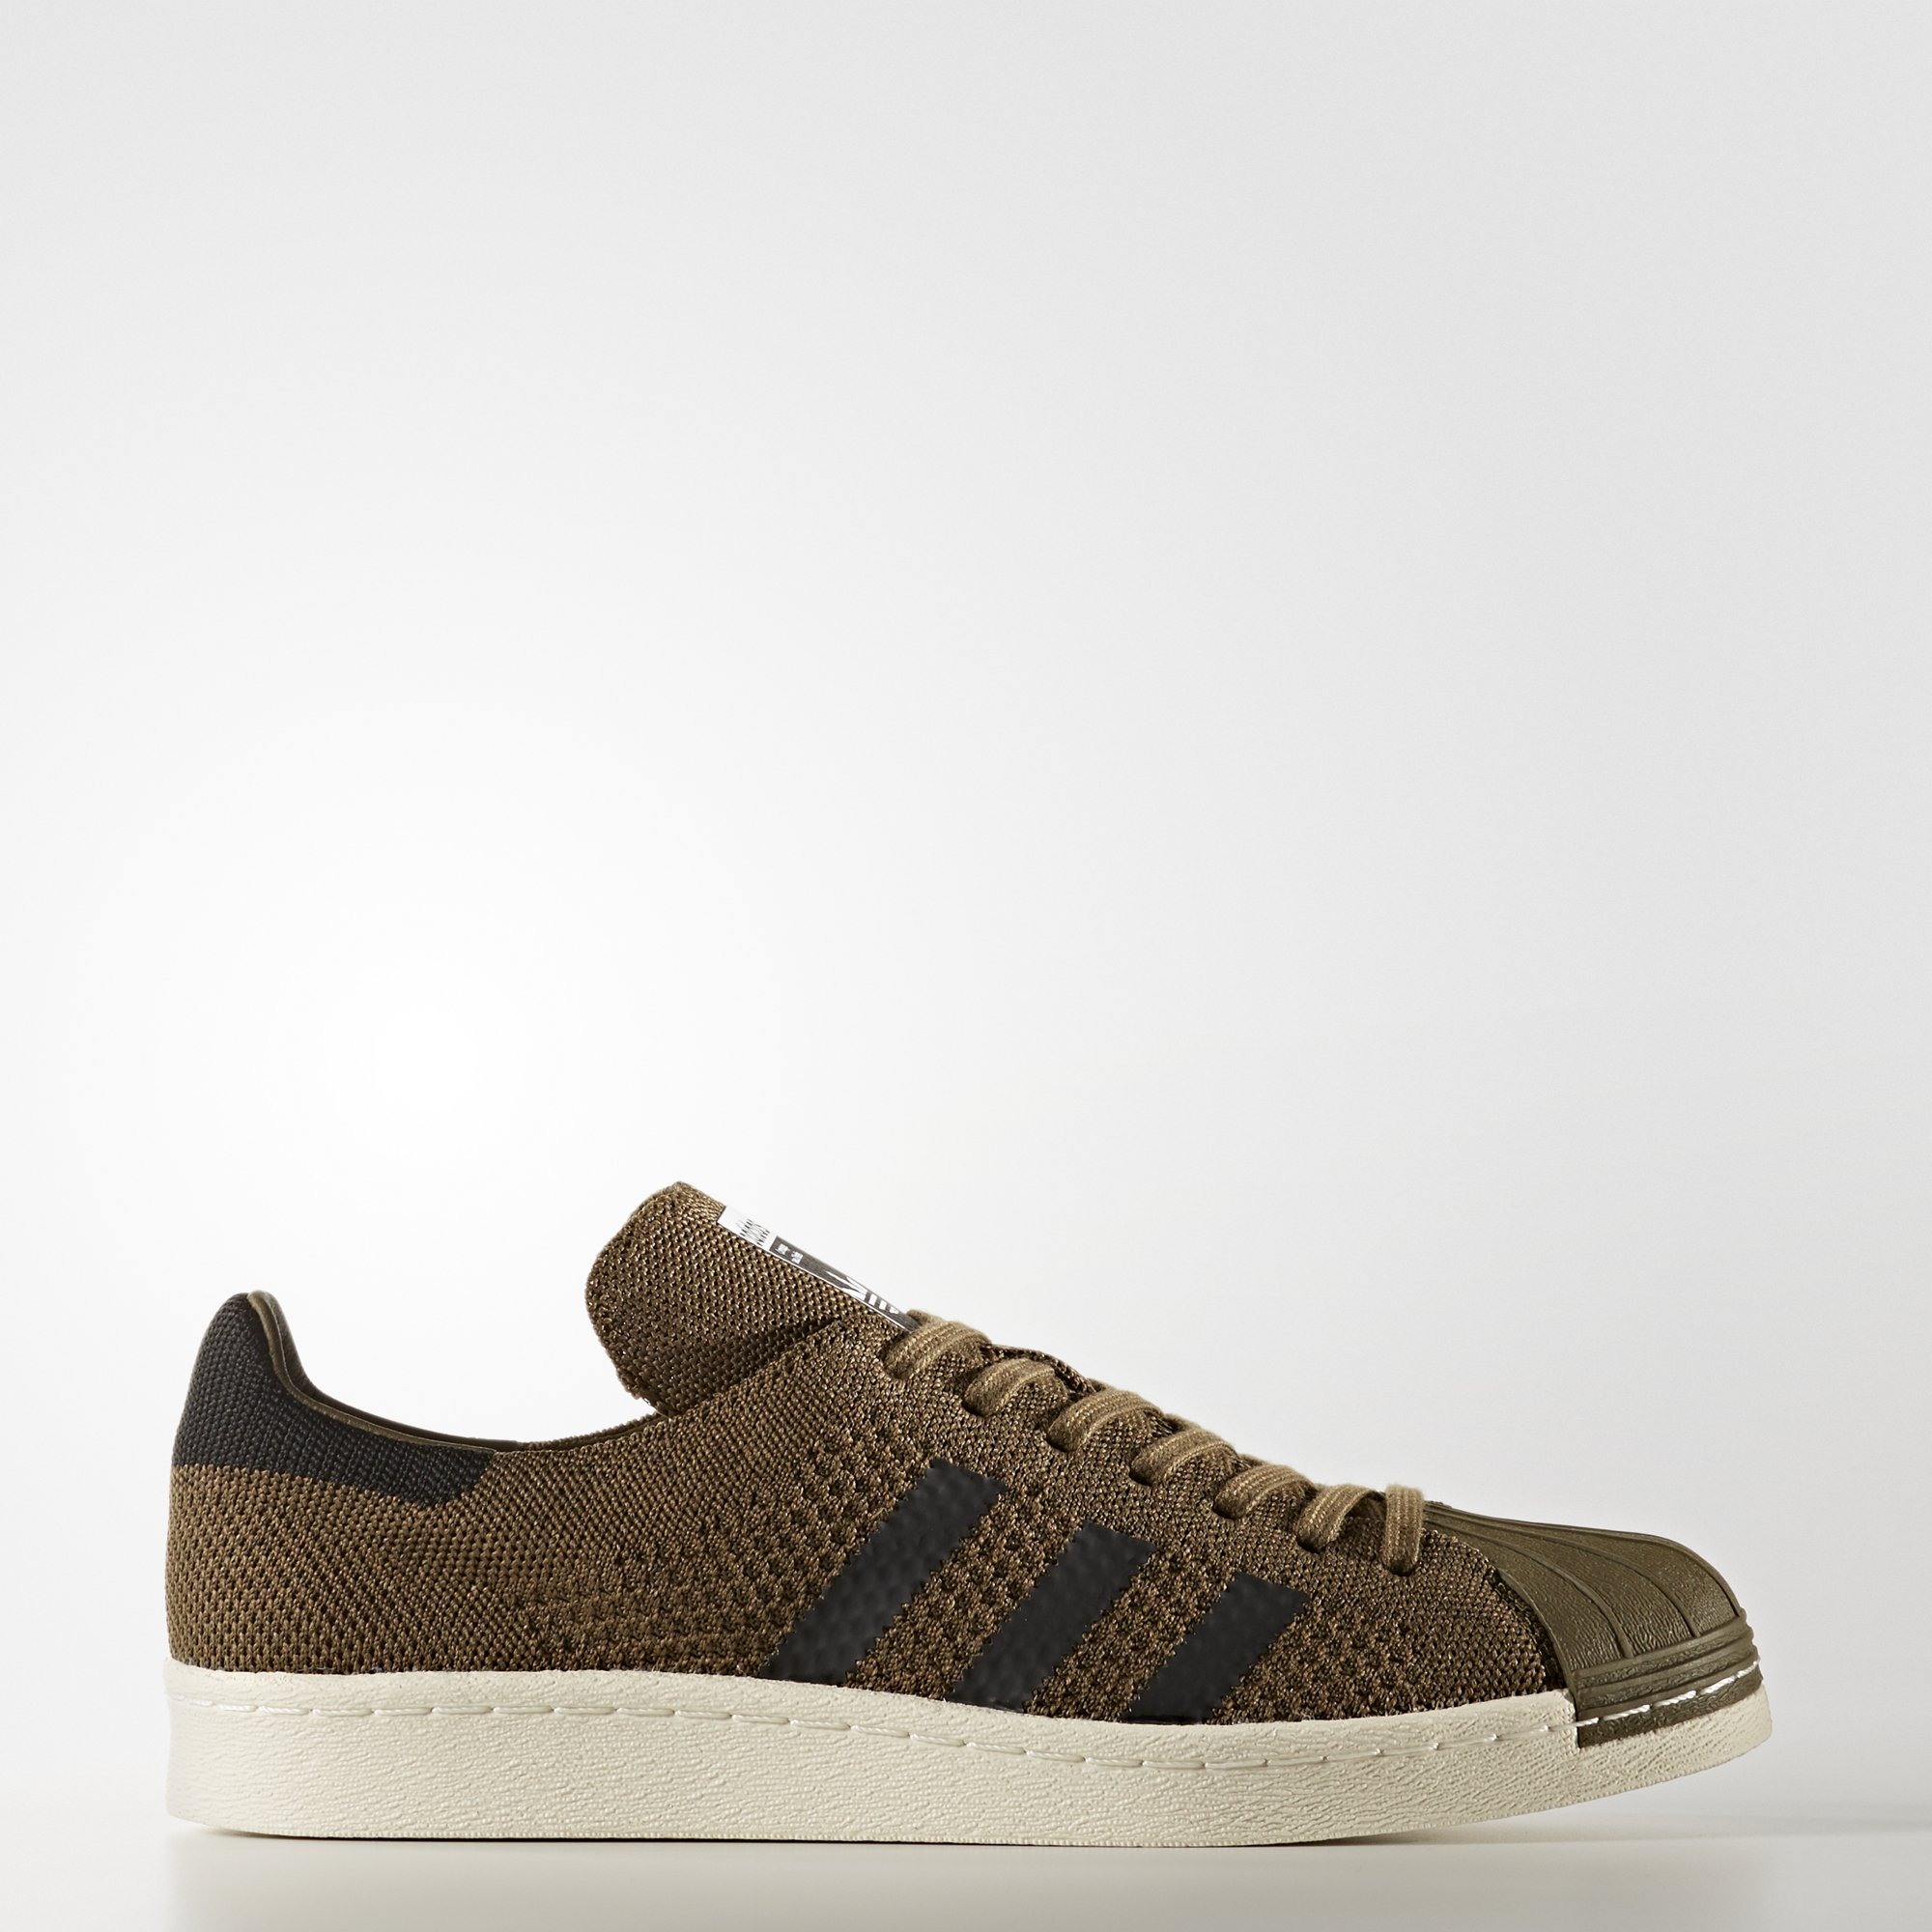 Strona główna :: adidas :: adidas Originals :: Buty Originals :: Buty Superstar 80s Primeknit Shoes